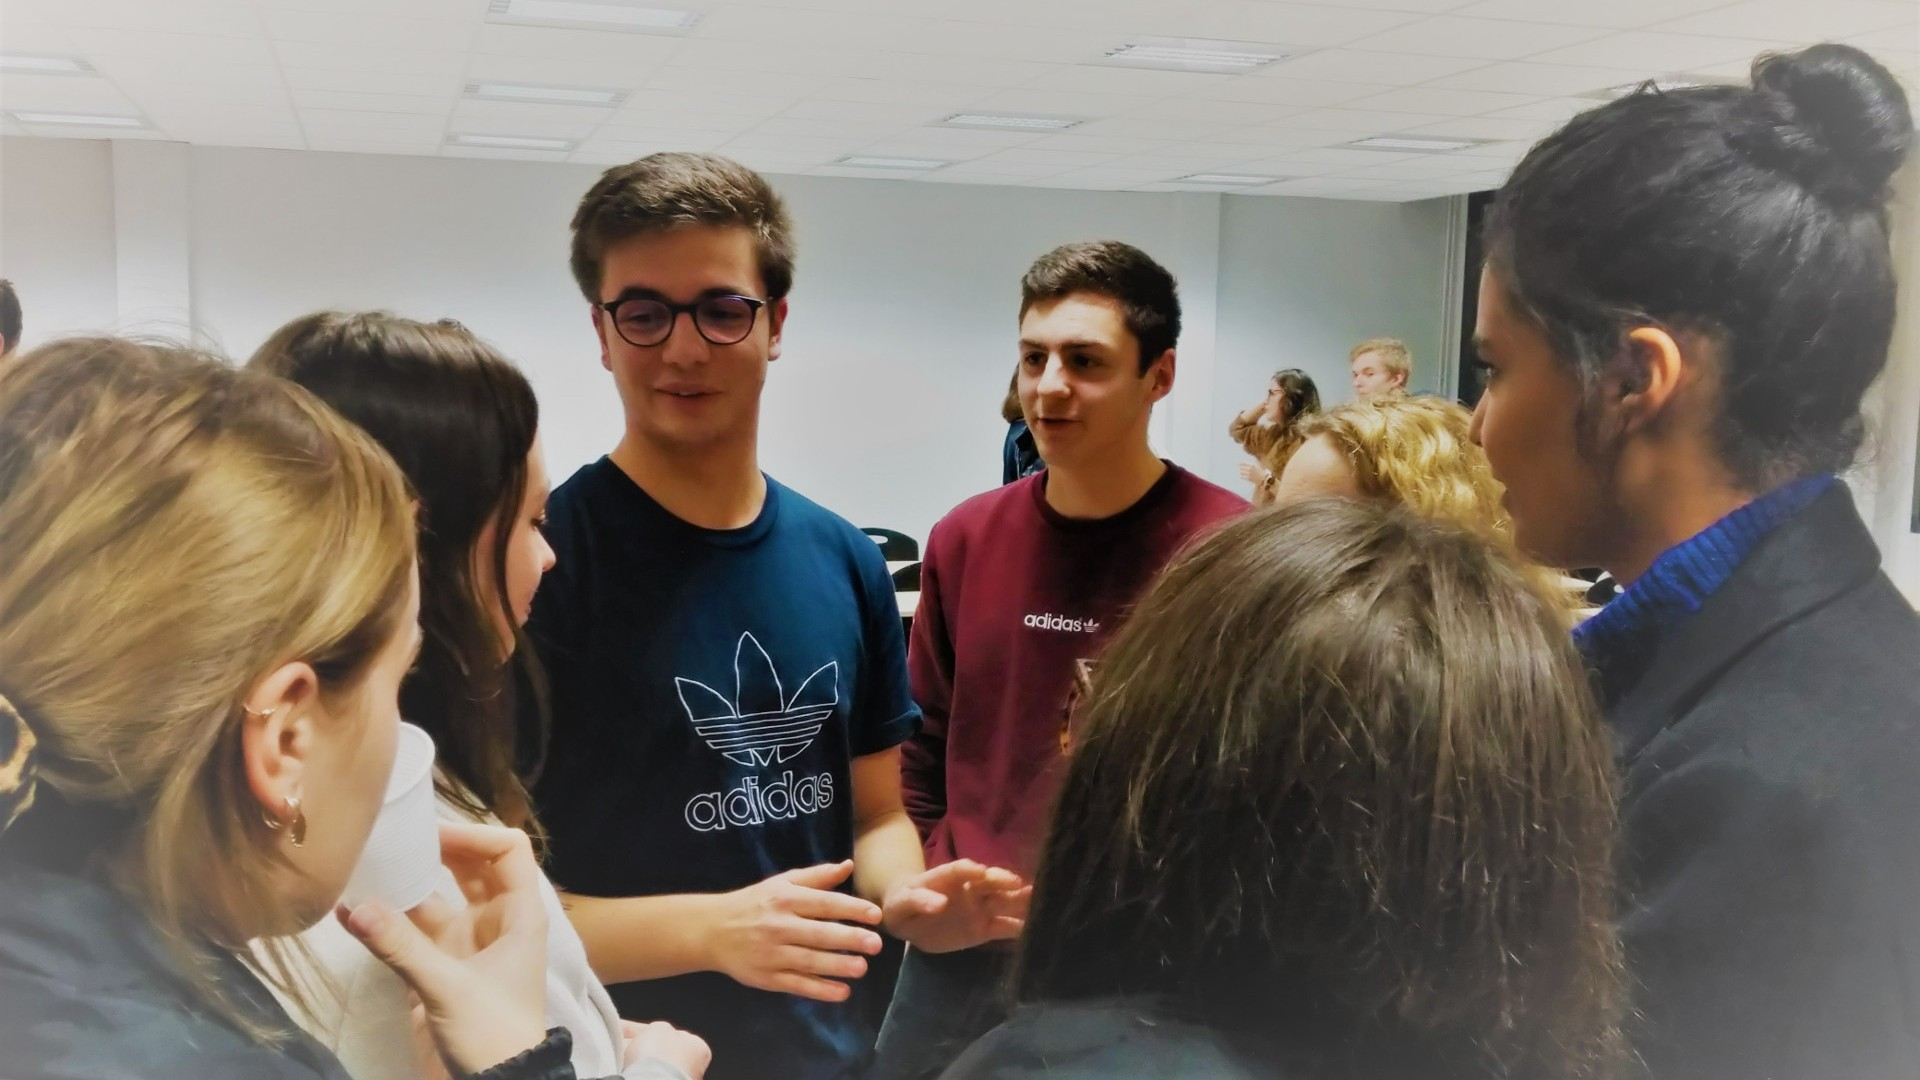 Forum des anciens novembre 2019 - Alexandre, normalien, est assailli de questions